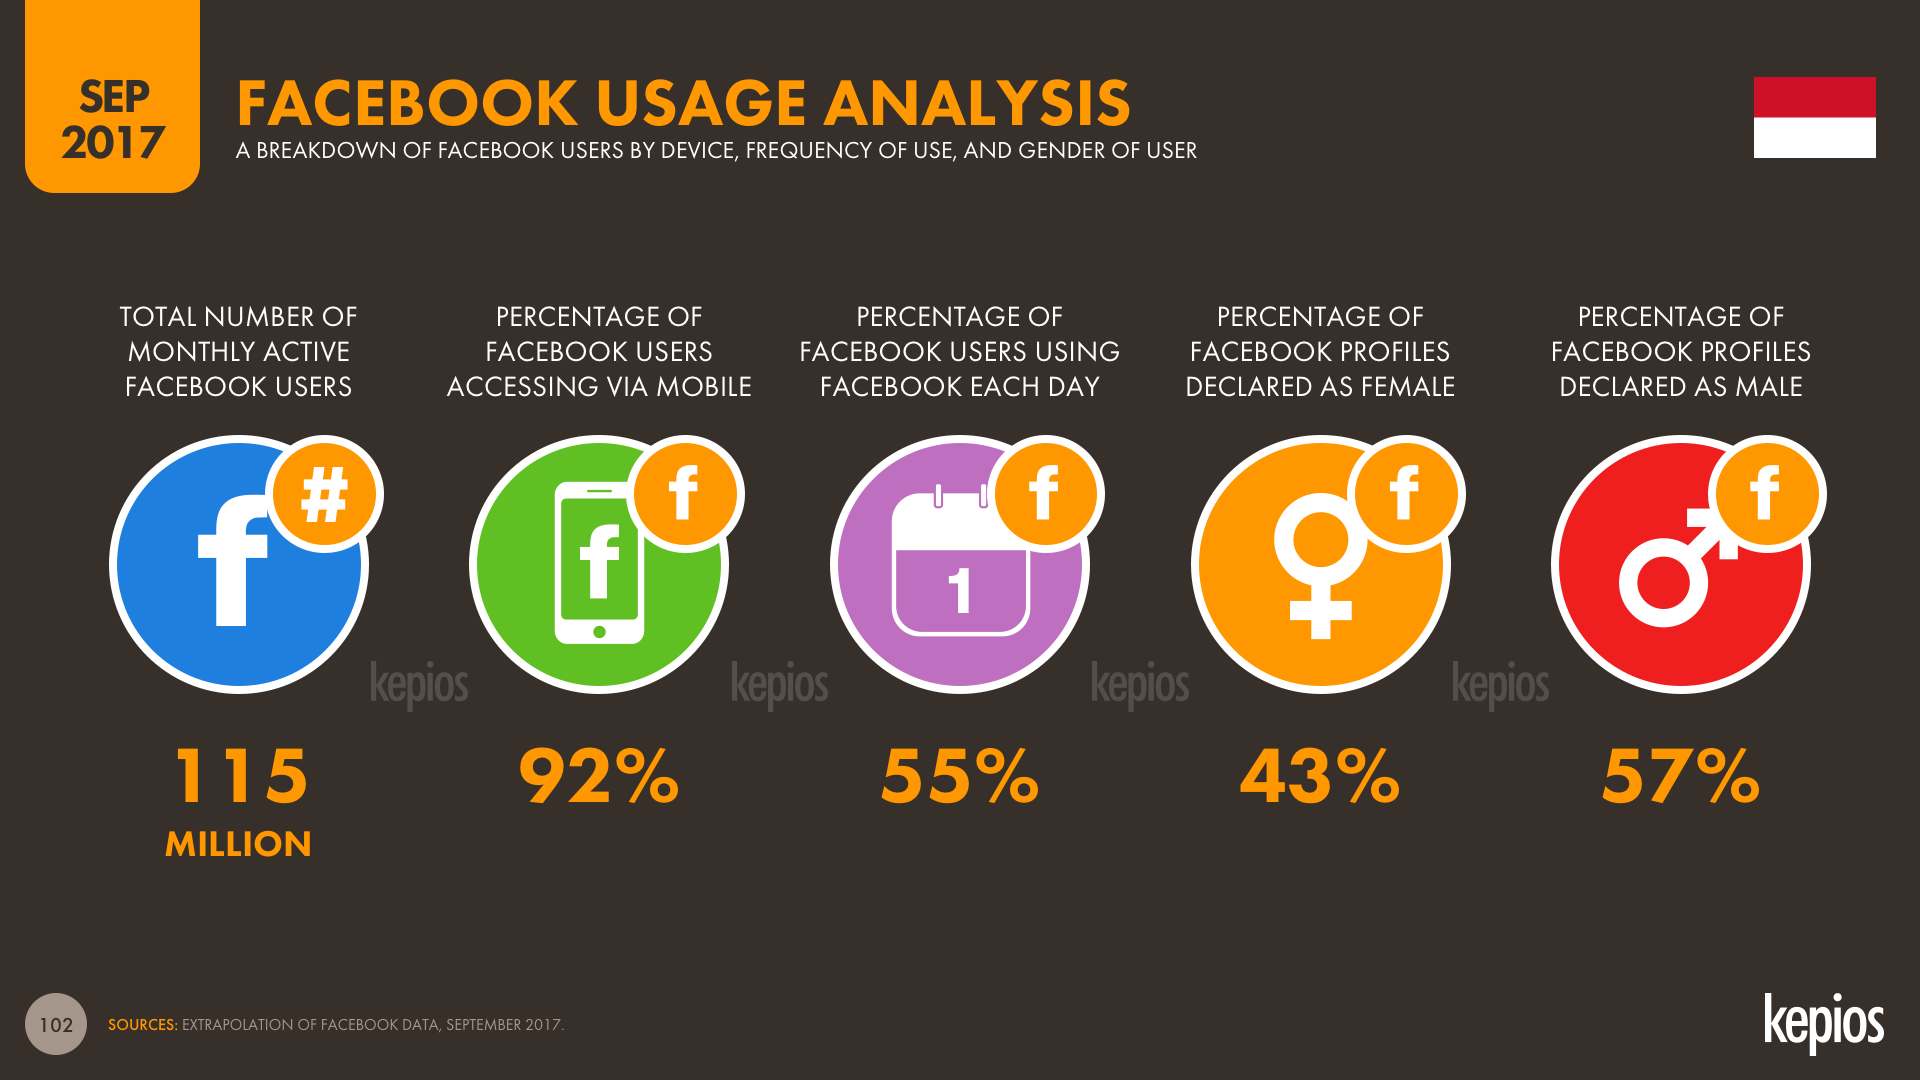 Indonesia: Facebook User Insights, Sep 2017